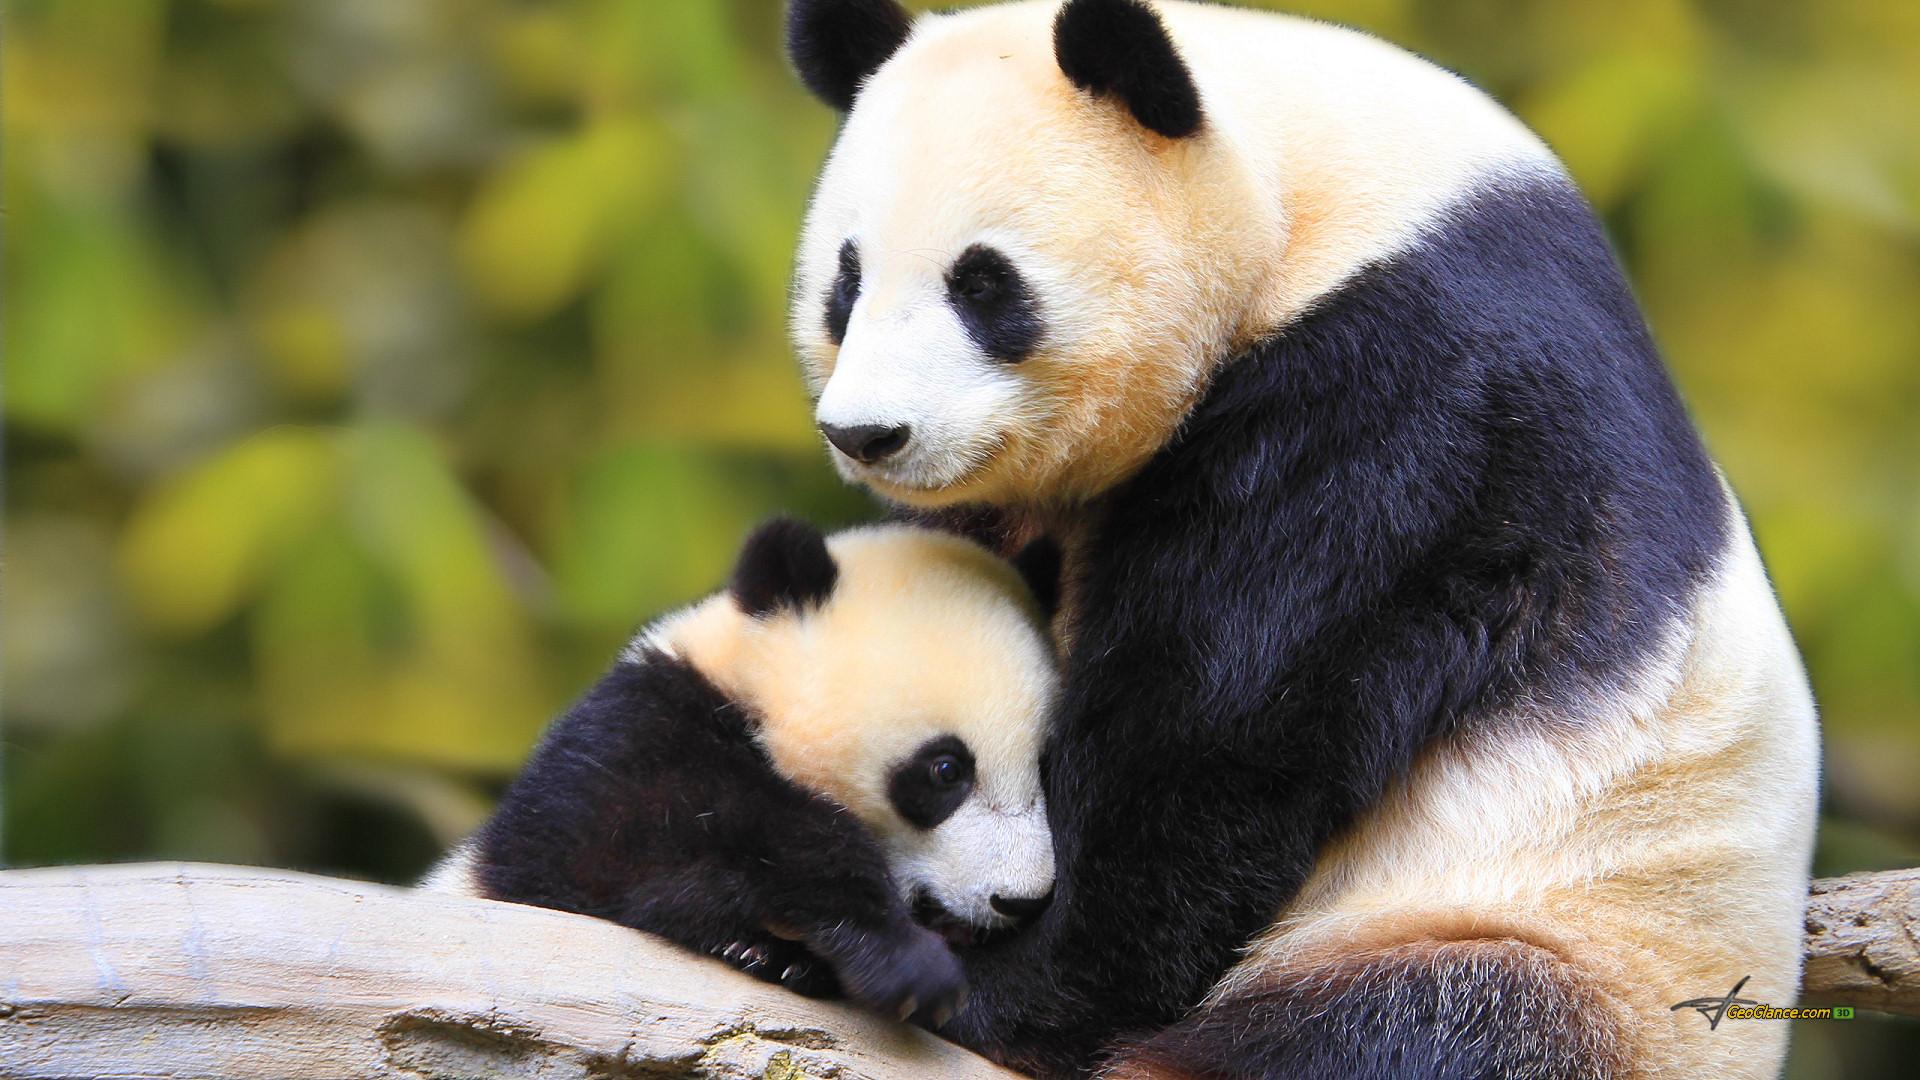 Mother and Baby Panda Wallpaper